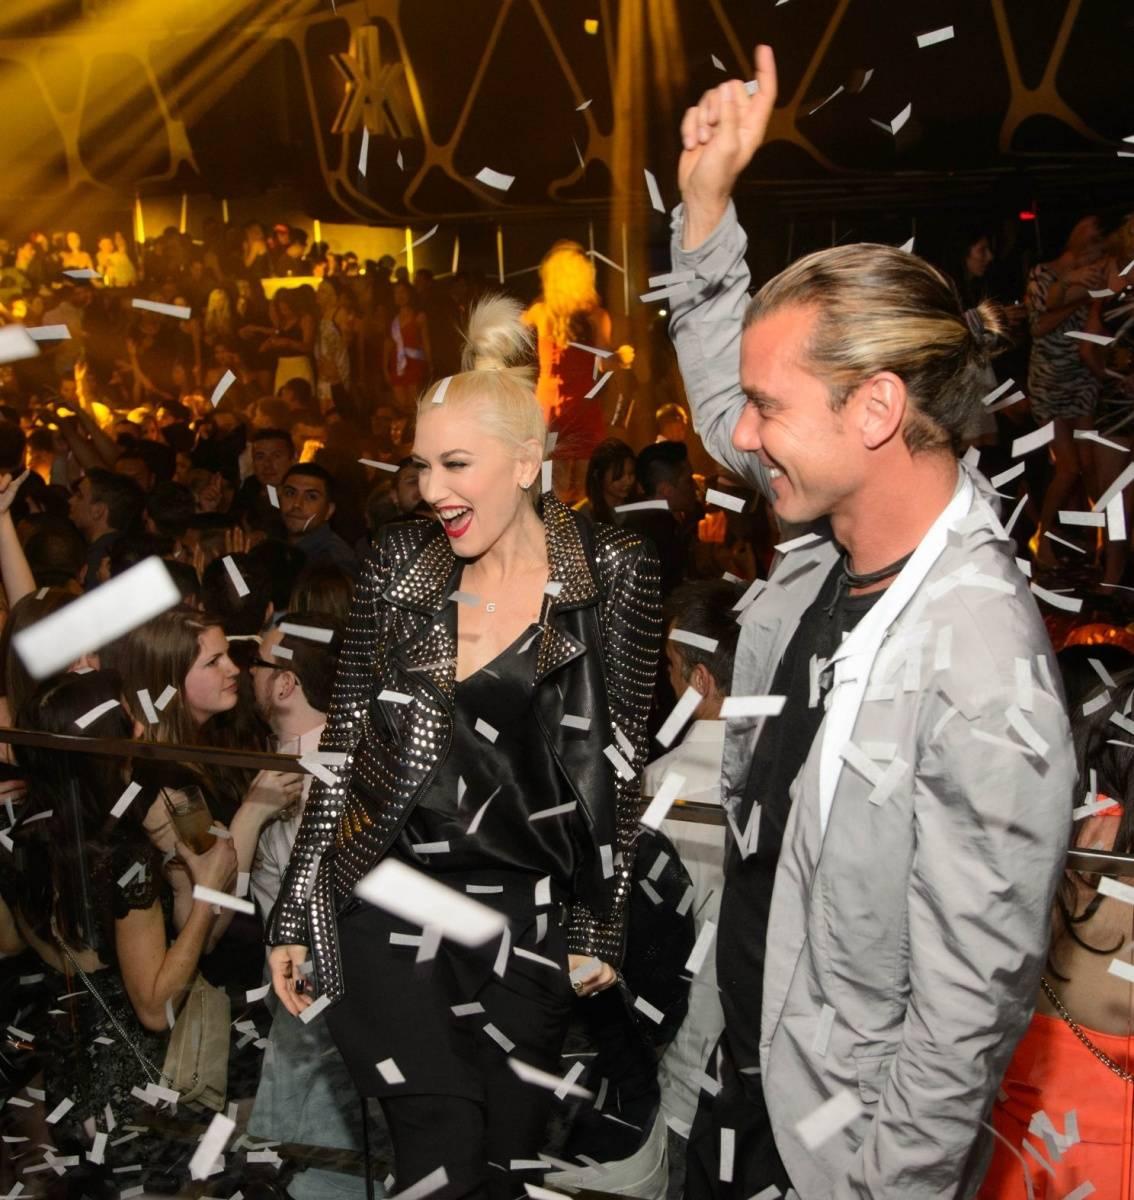 Gwen and Gavin_Confetti_Hakkasan Las Vegas Nightclub